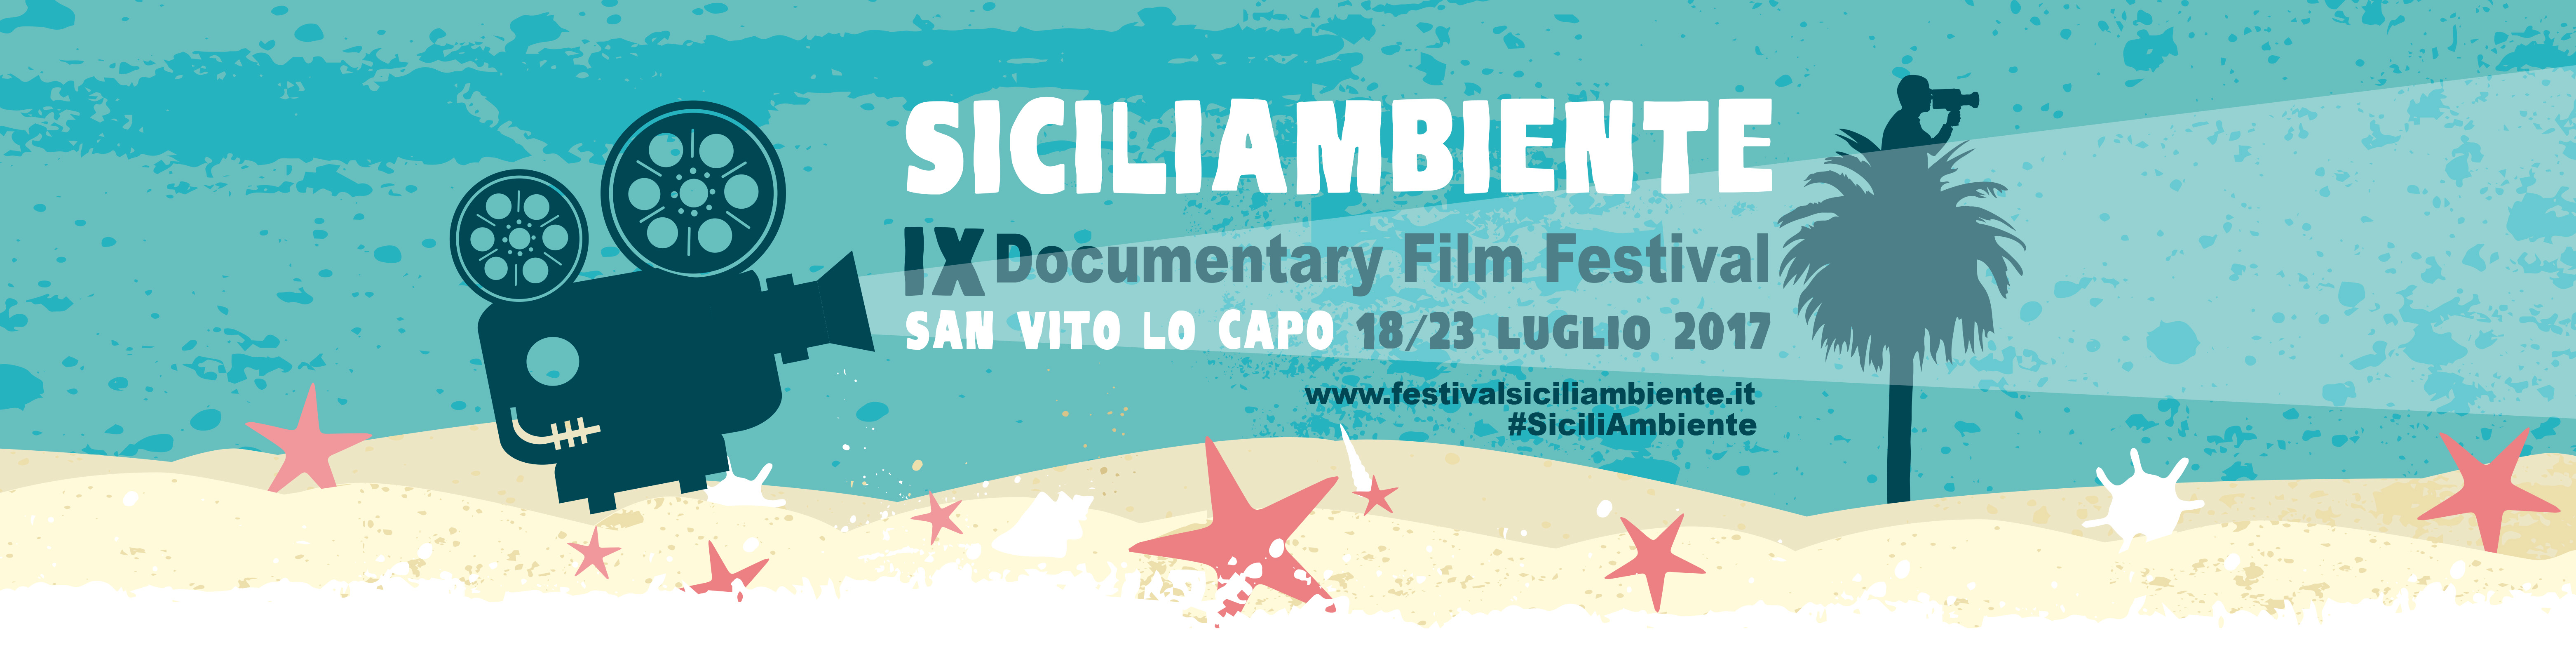 Festival Siciliambiente - Hotel Trinacria